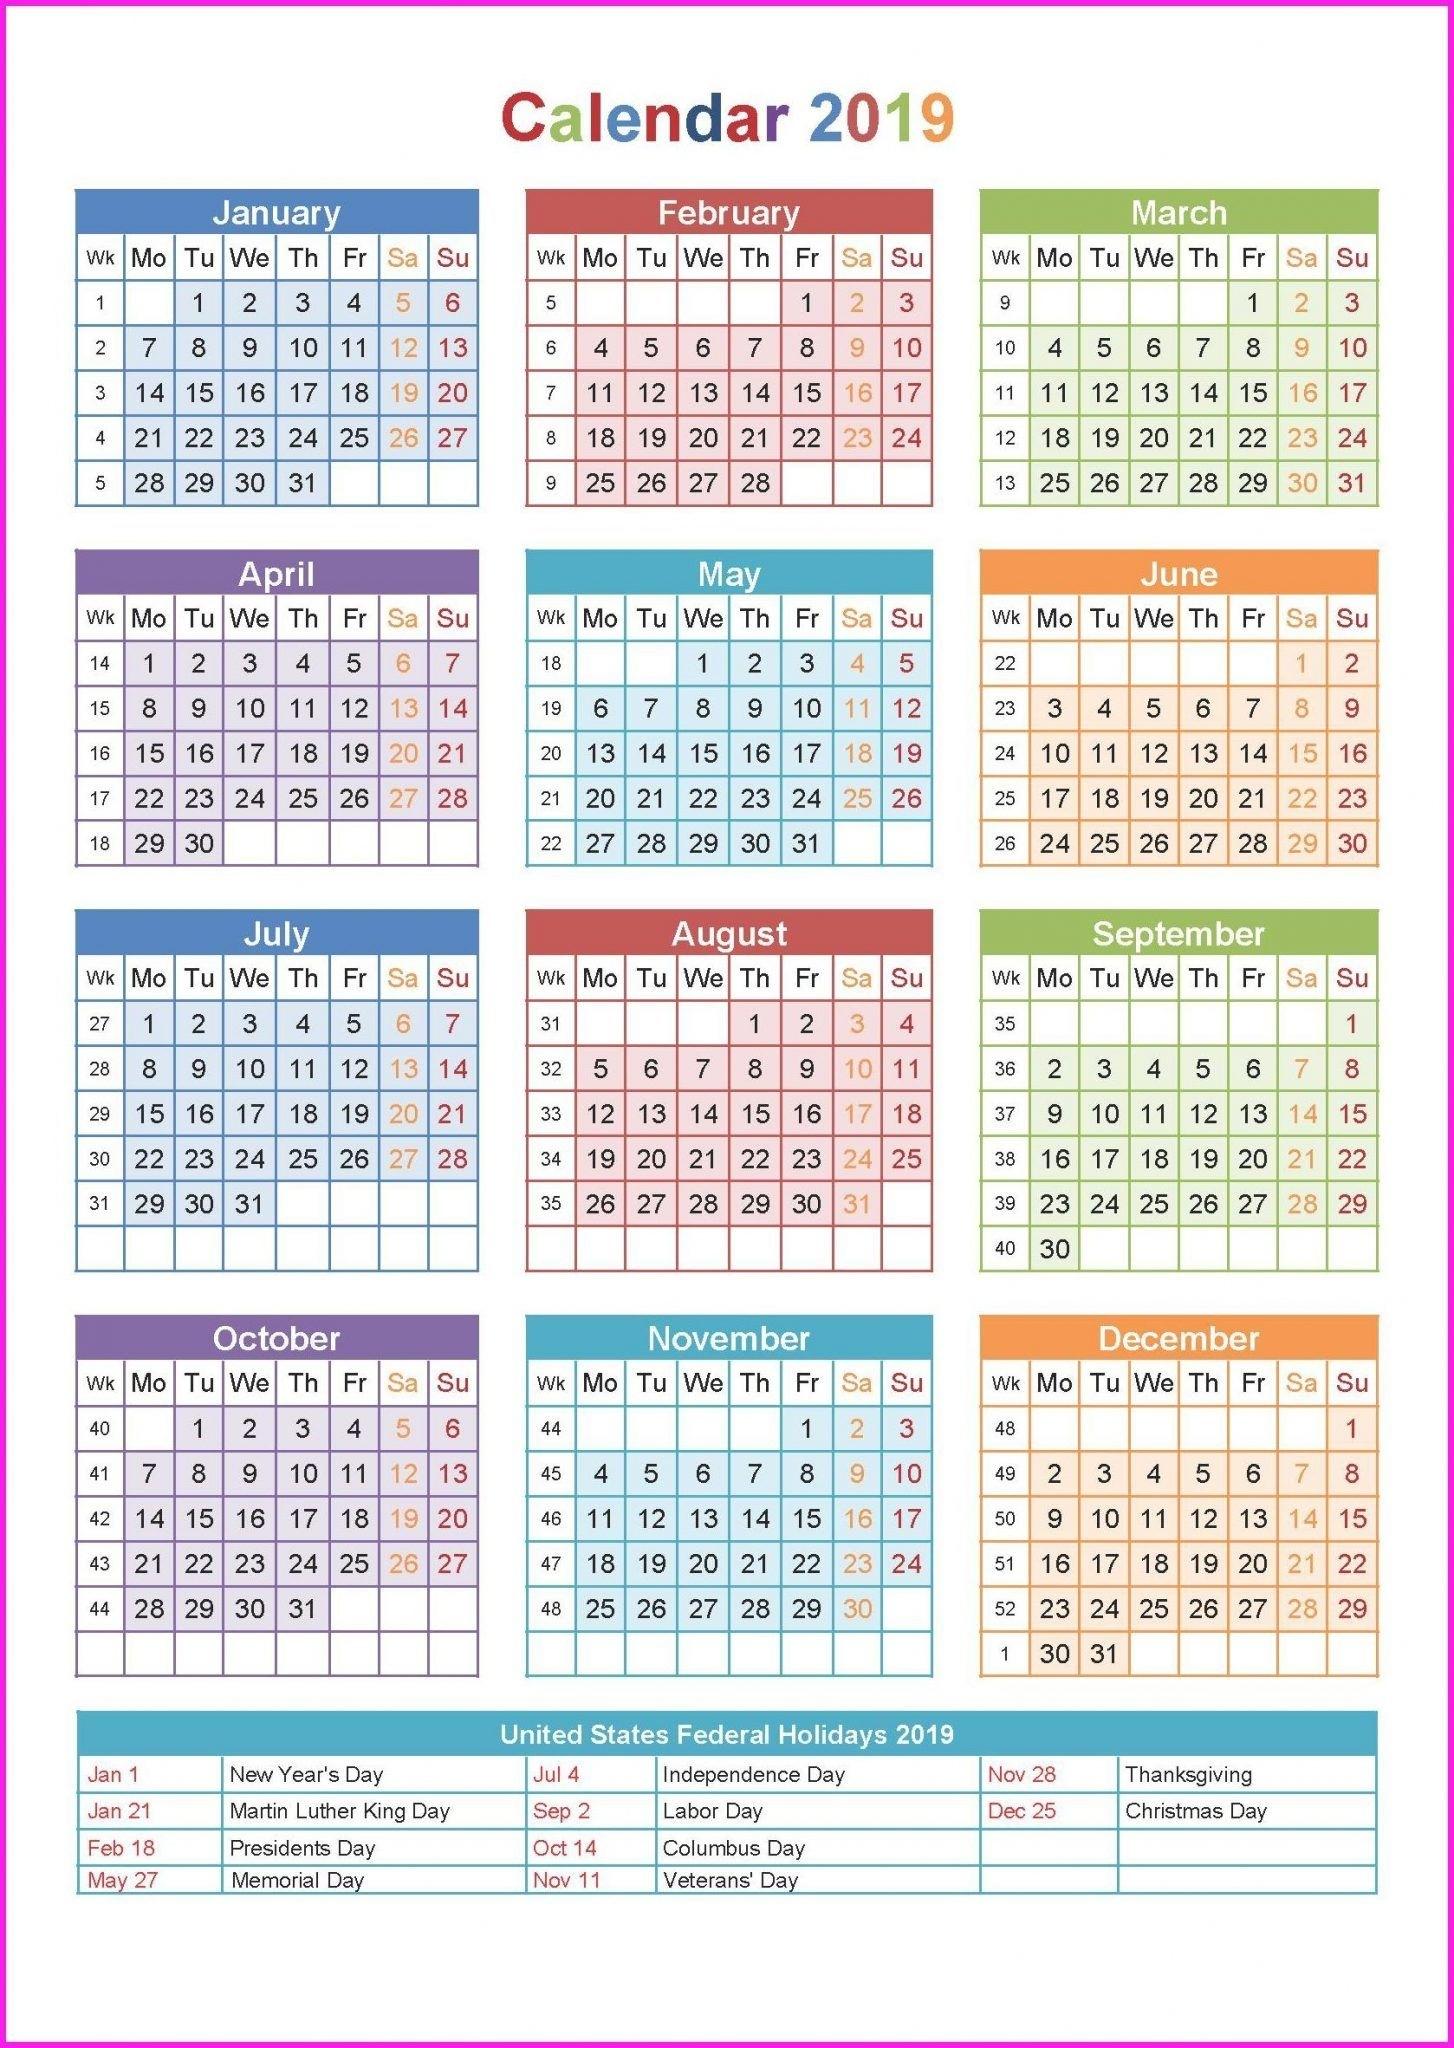 Yearly 2019 Calendar Printable | Top 10 Free 2019 Calendar Printable for 1 Week Vacation Calendar Printable